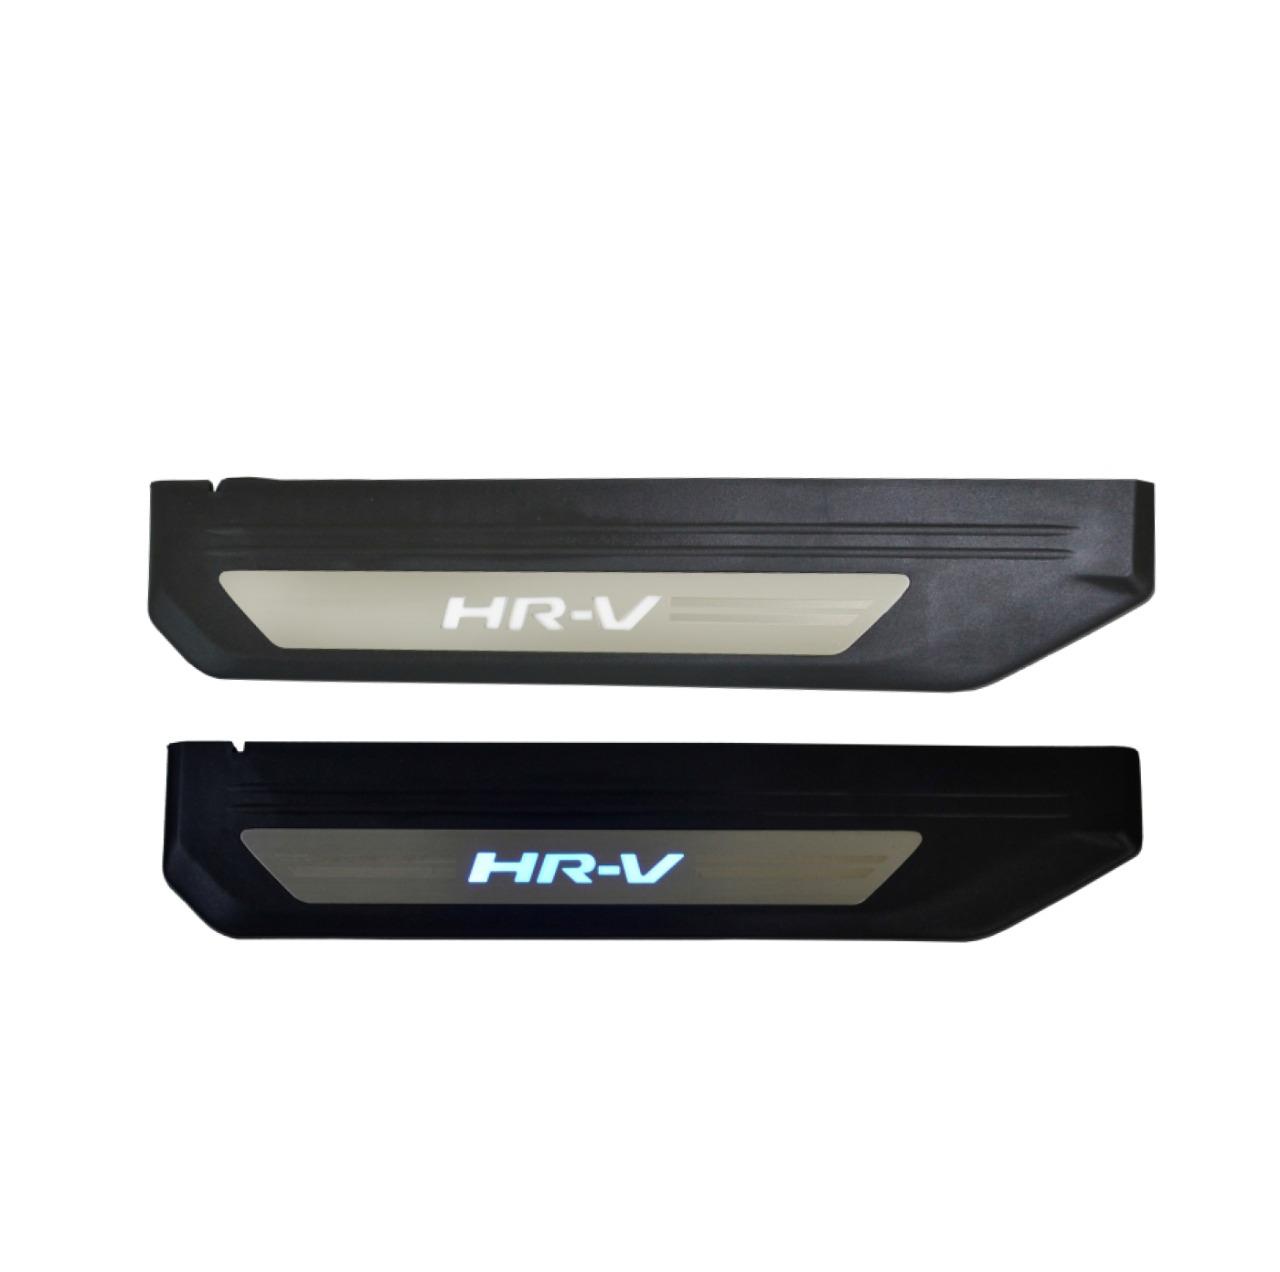 Kit Soleira de Porta C/ LED Honda HR-V Inox Iluminada SLA878